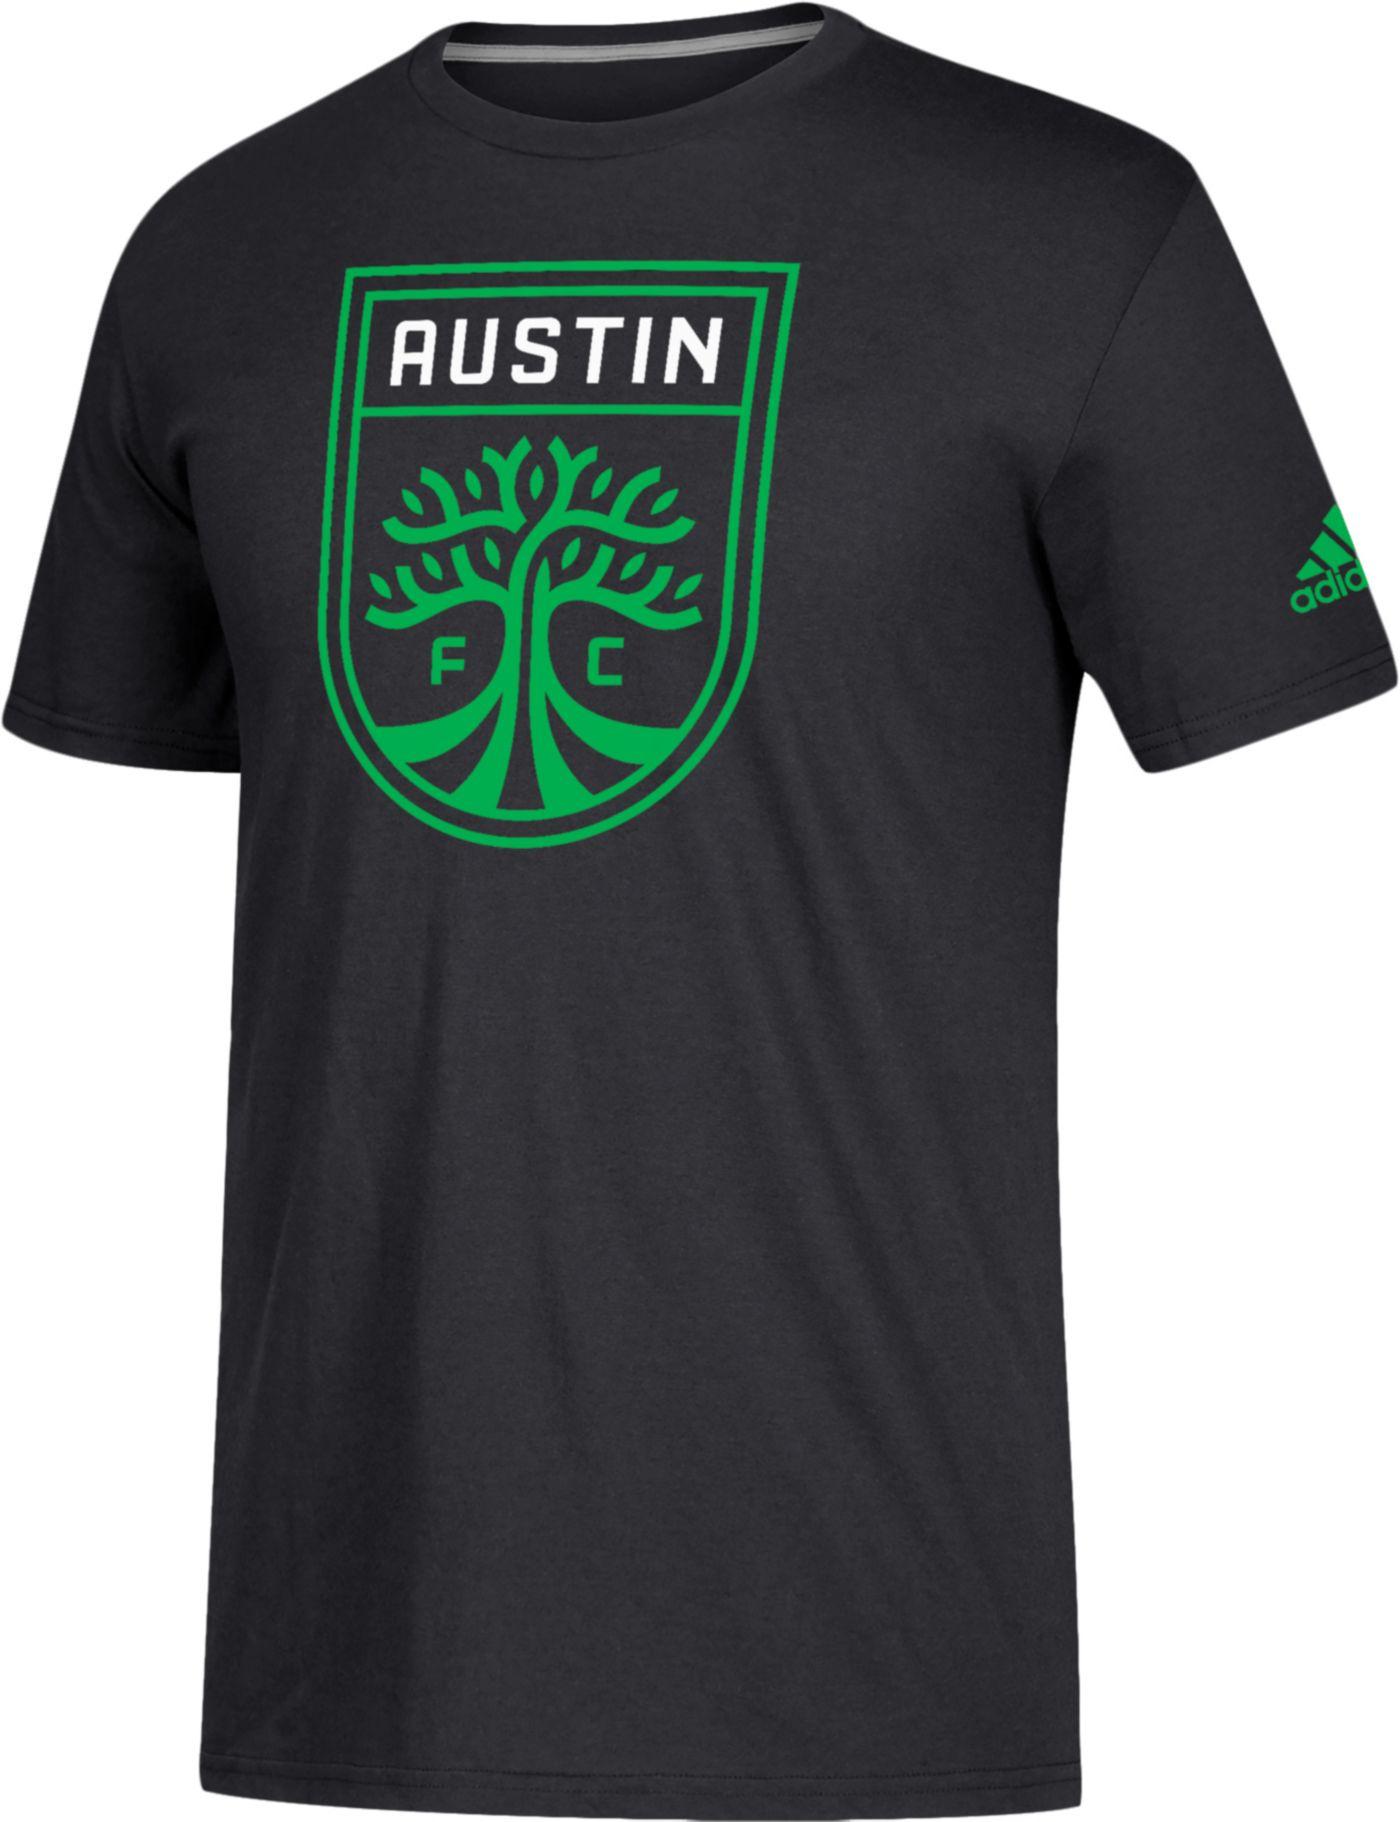 adidas Men's Austin FC Logo Black T-Shirt